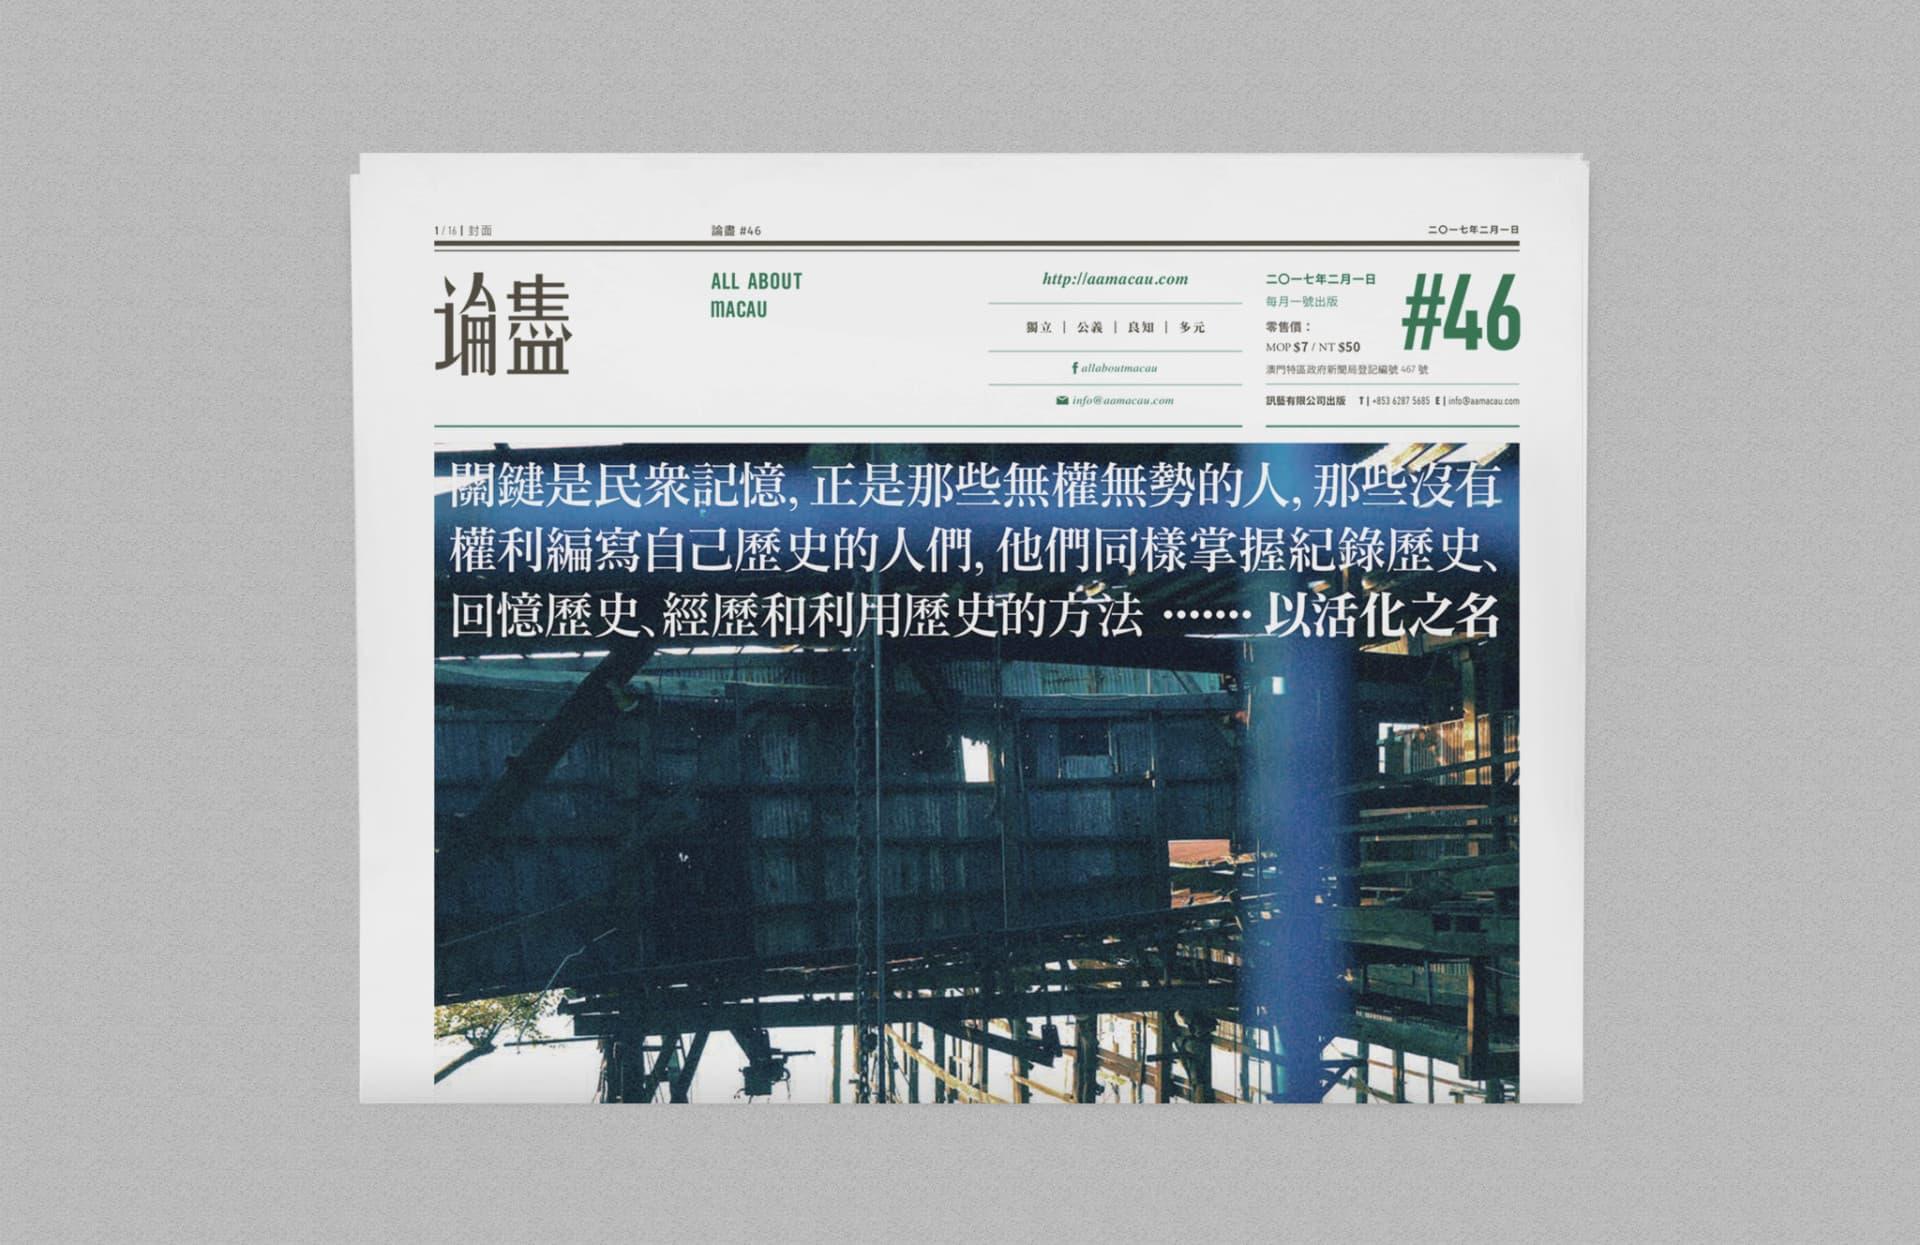 046-web-banner